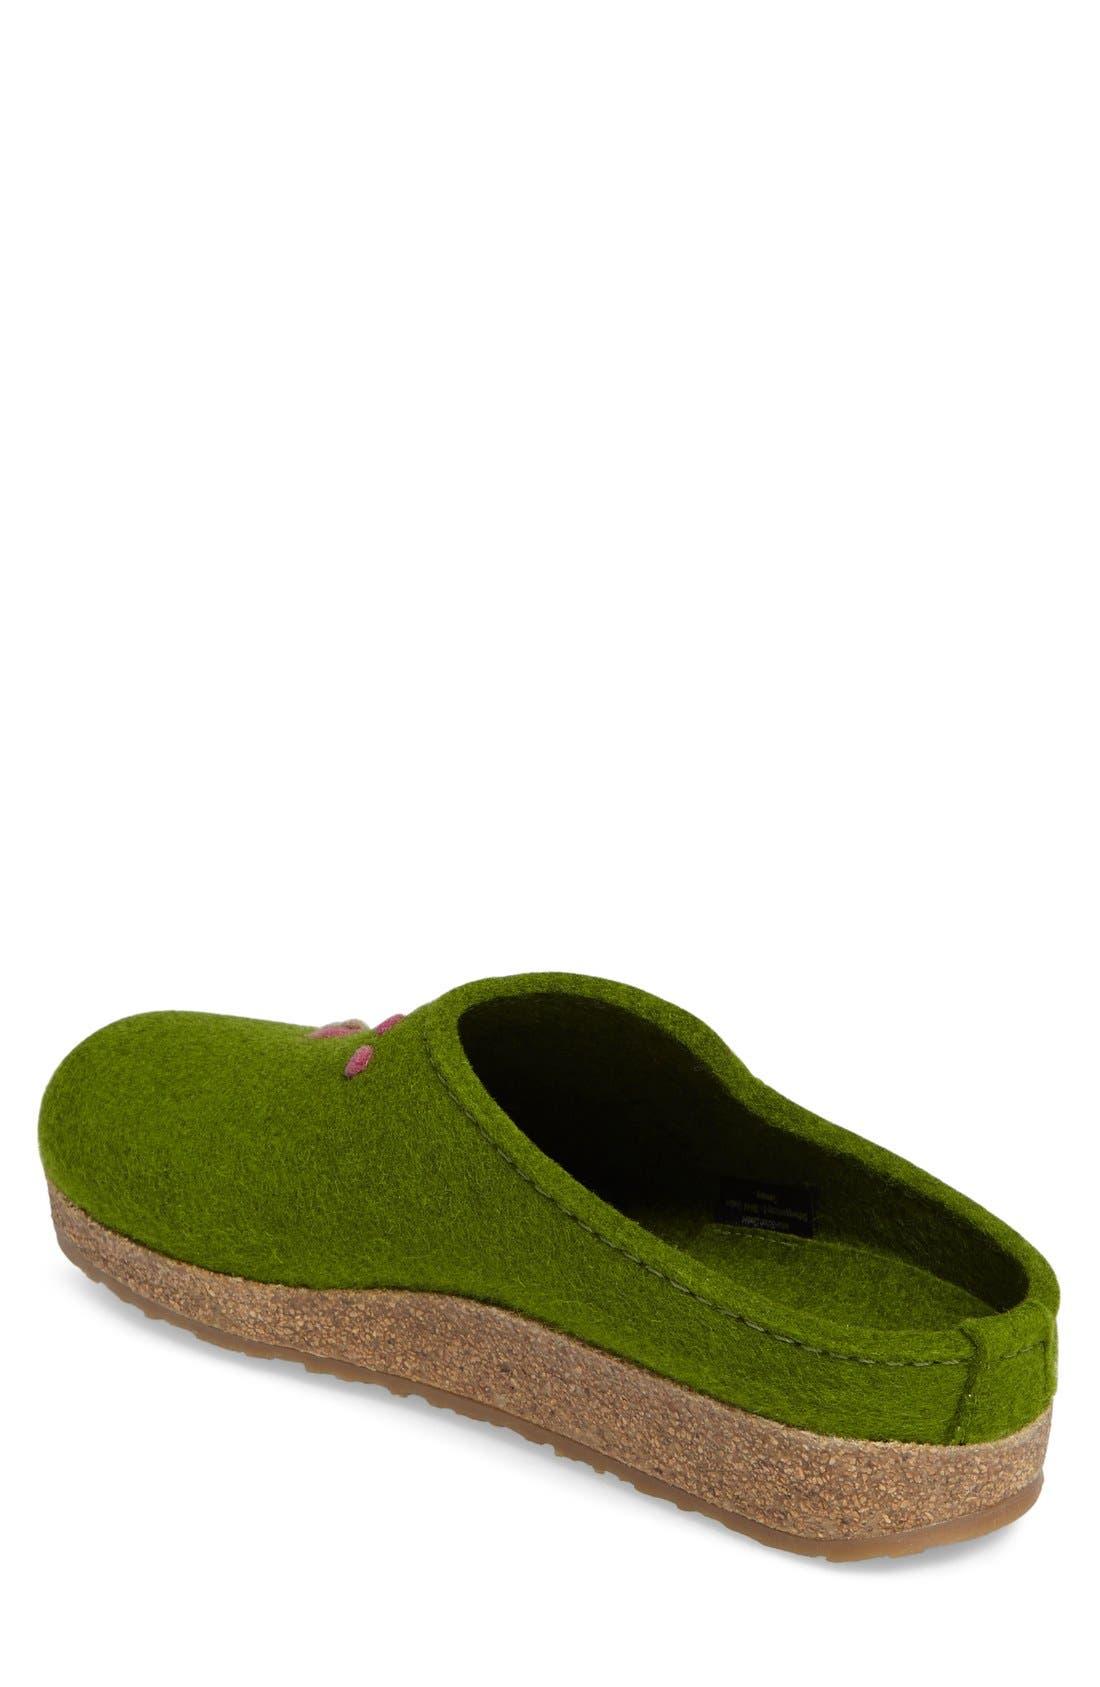 Paisley Slipper,                             Alternate thumbnail 2, color,                             Green Wool